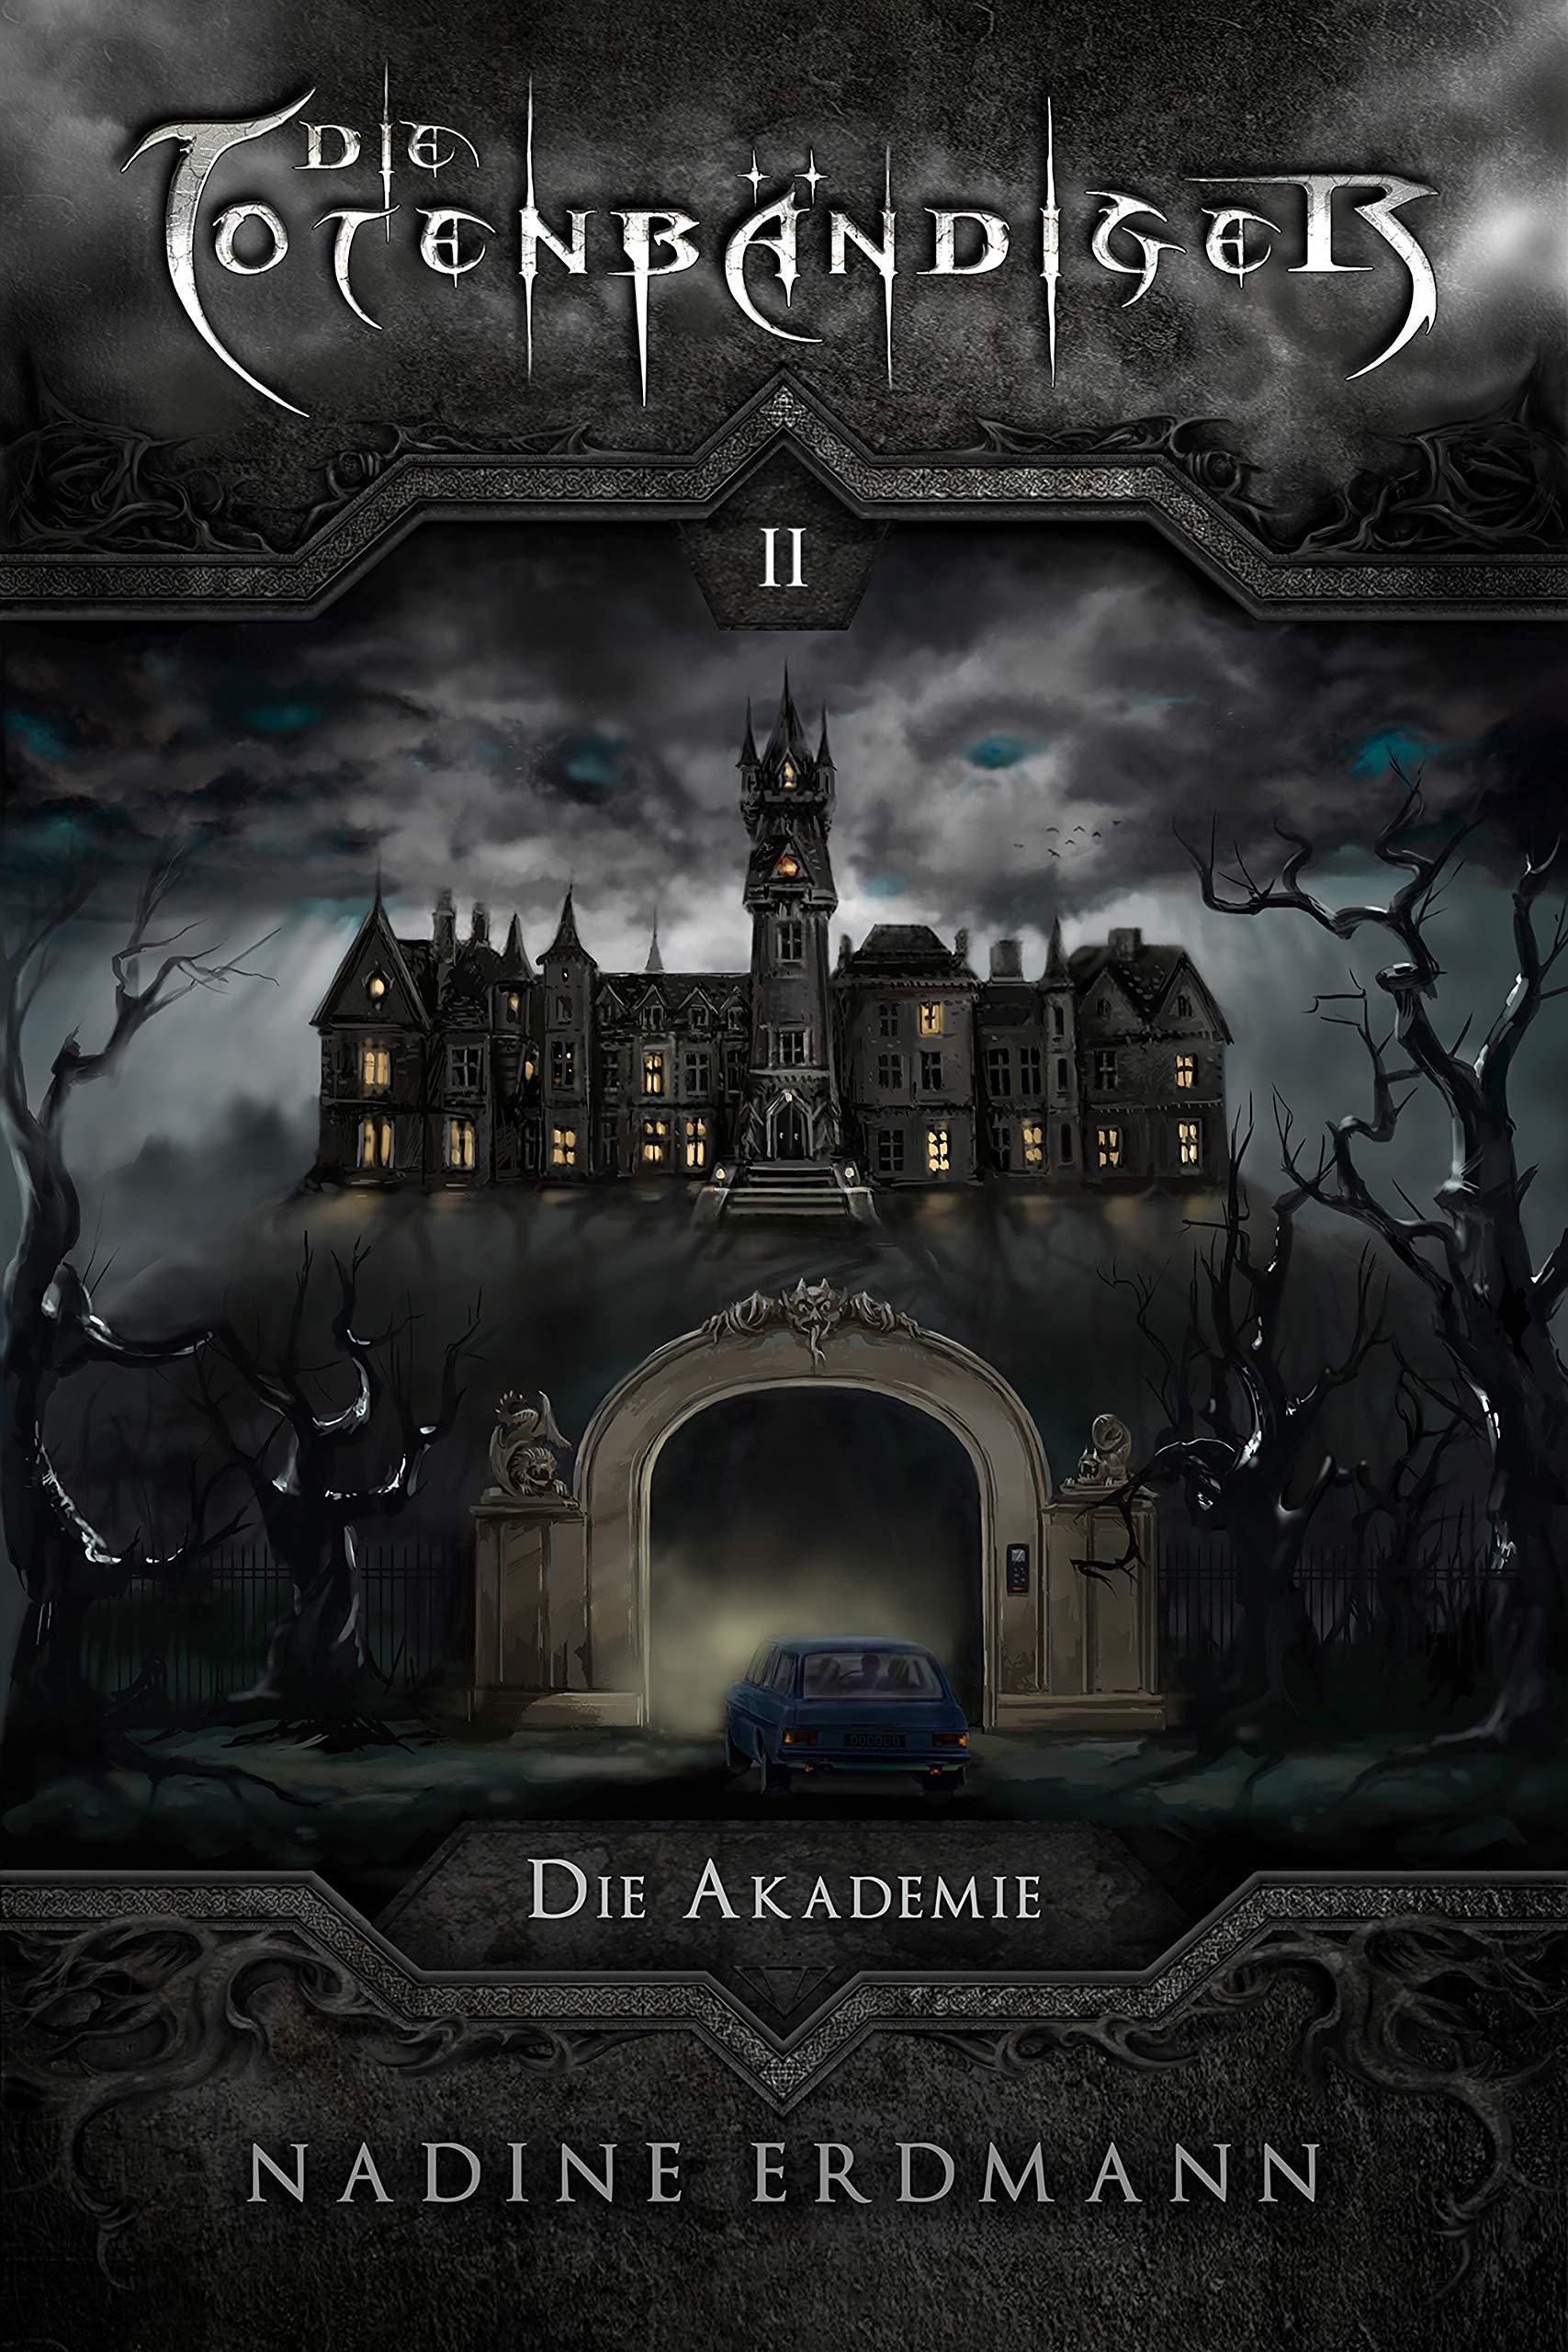 Die Totenbändiger   Band 2  Die Akademie